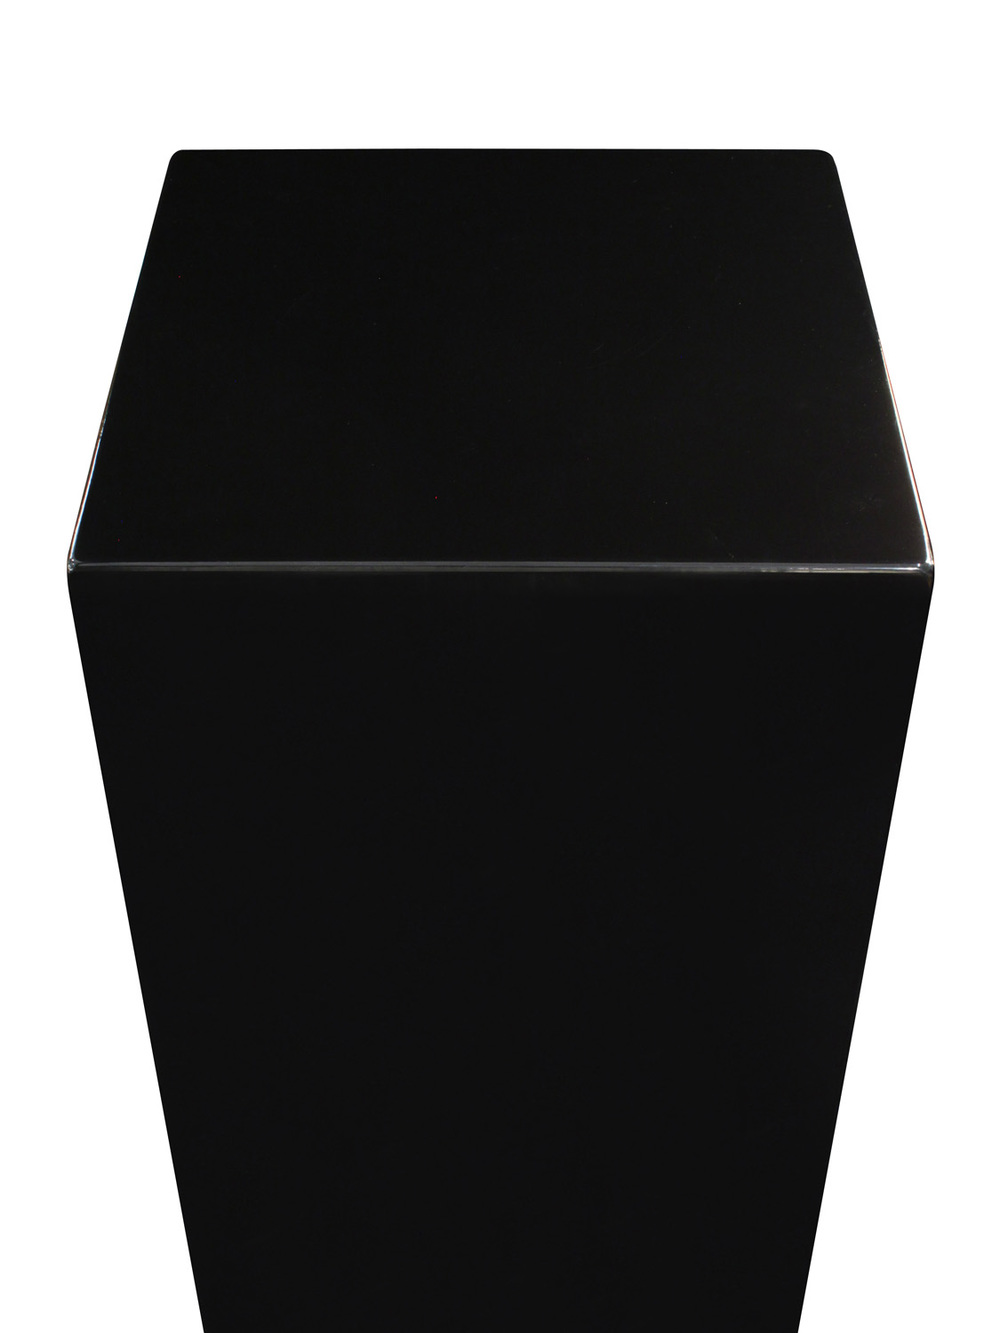 80's 35 blk lucite pedestal20 detail1 hires.jpg